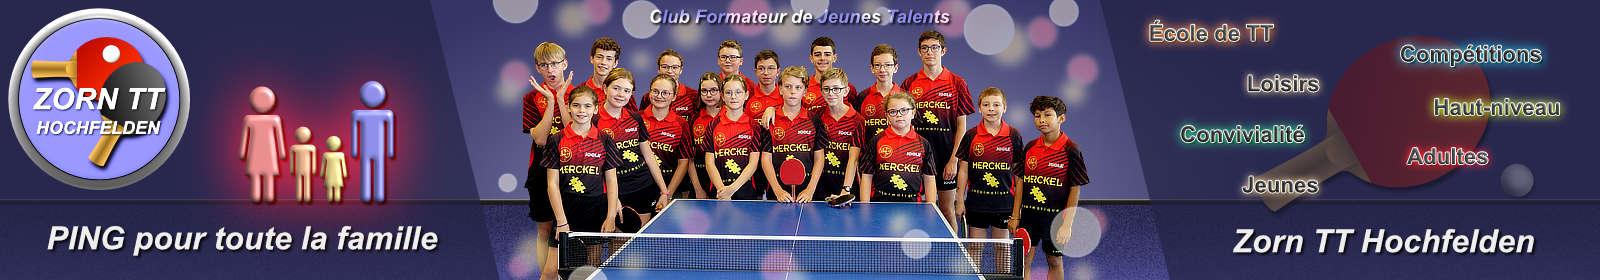 2019_12_jeunes_agr_entête_site.jpg